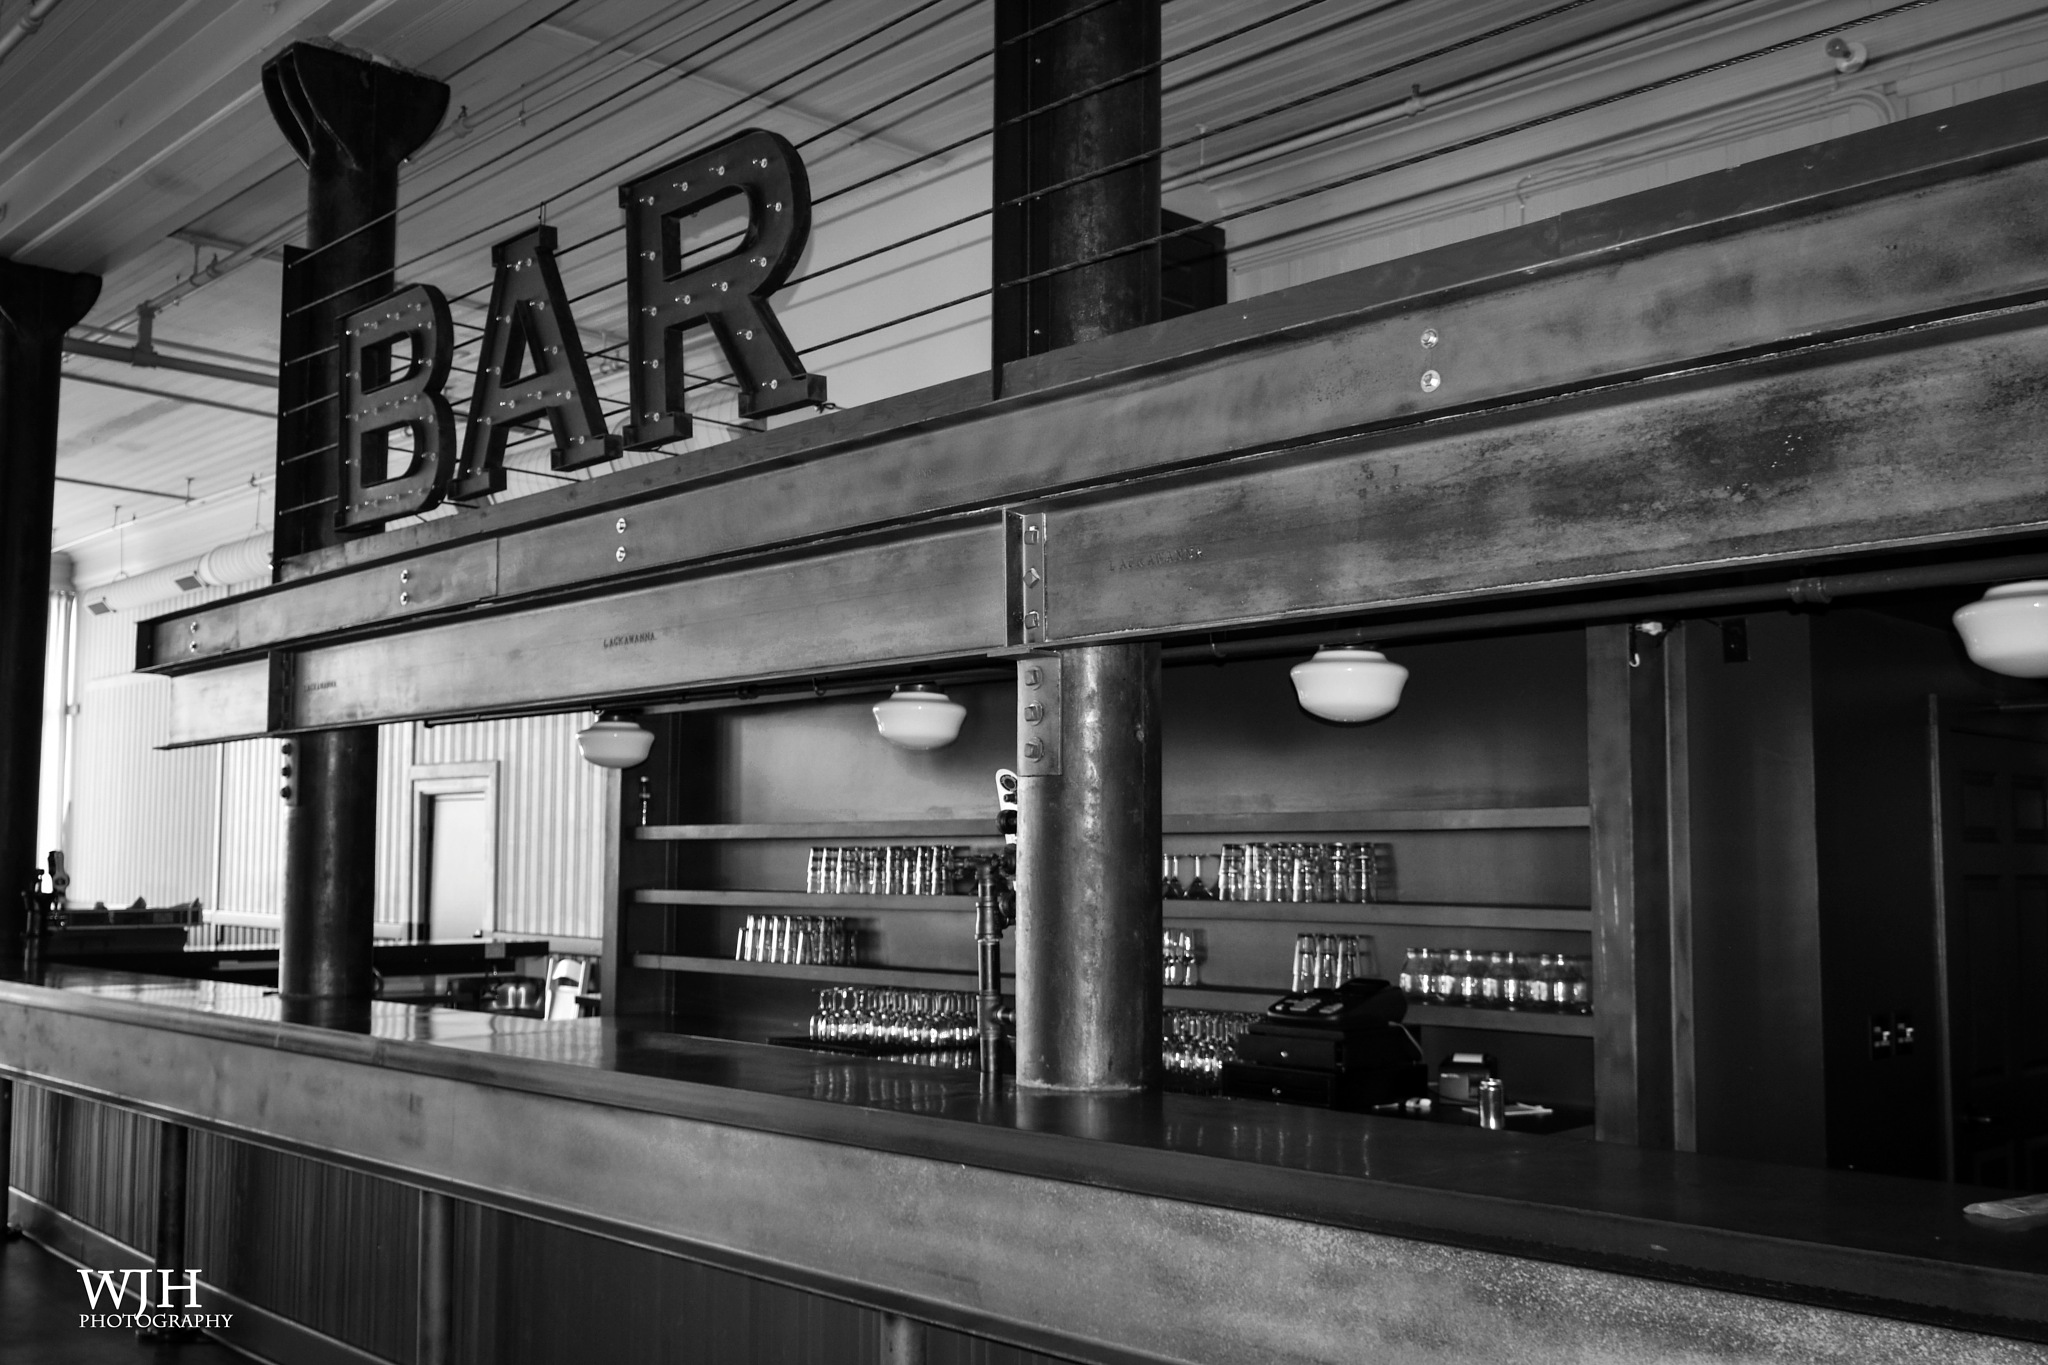 Bar by wjh